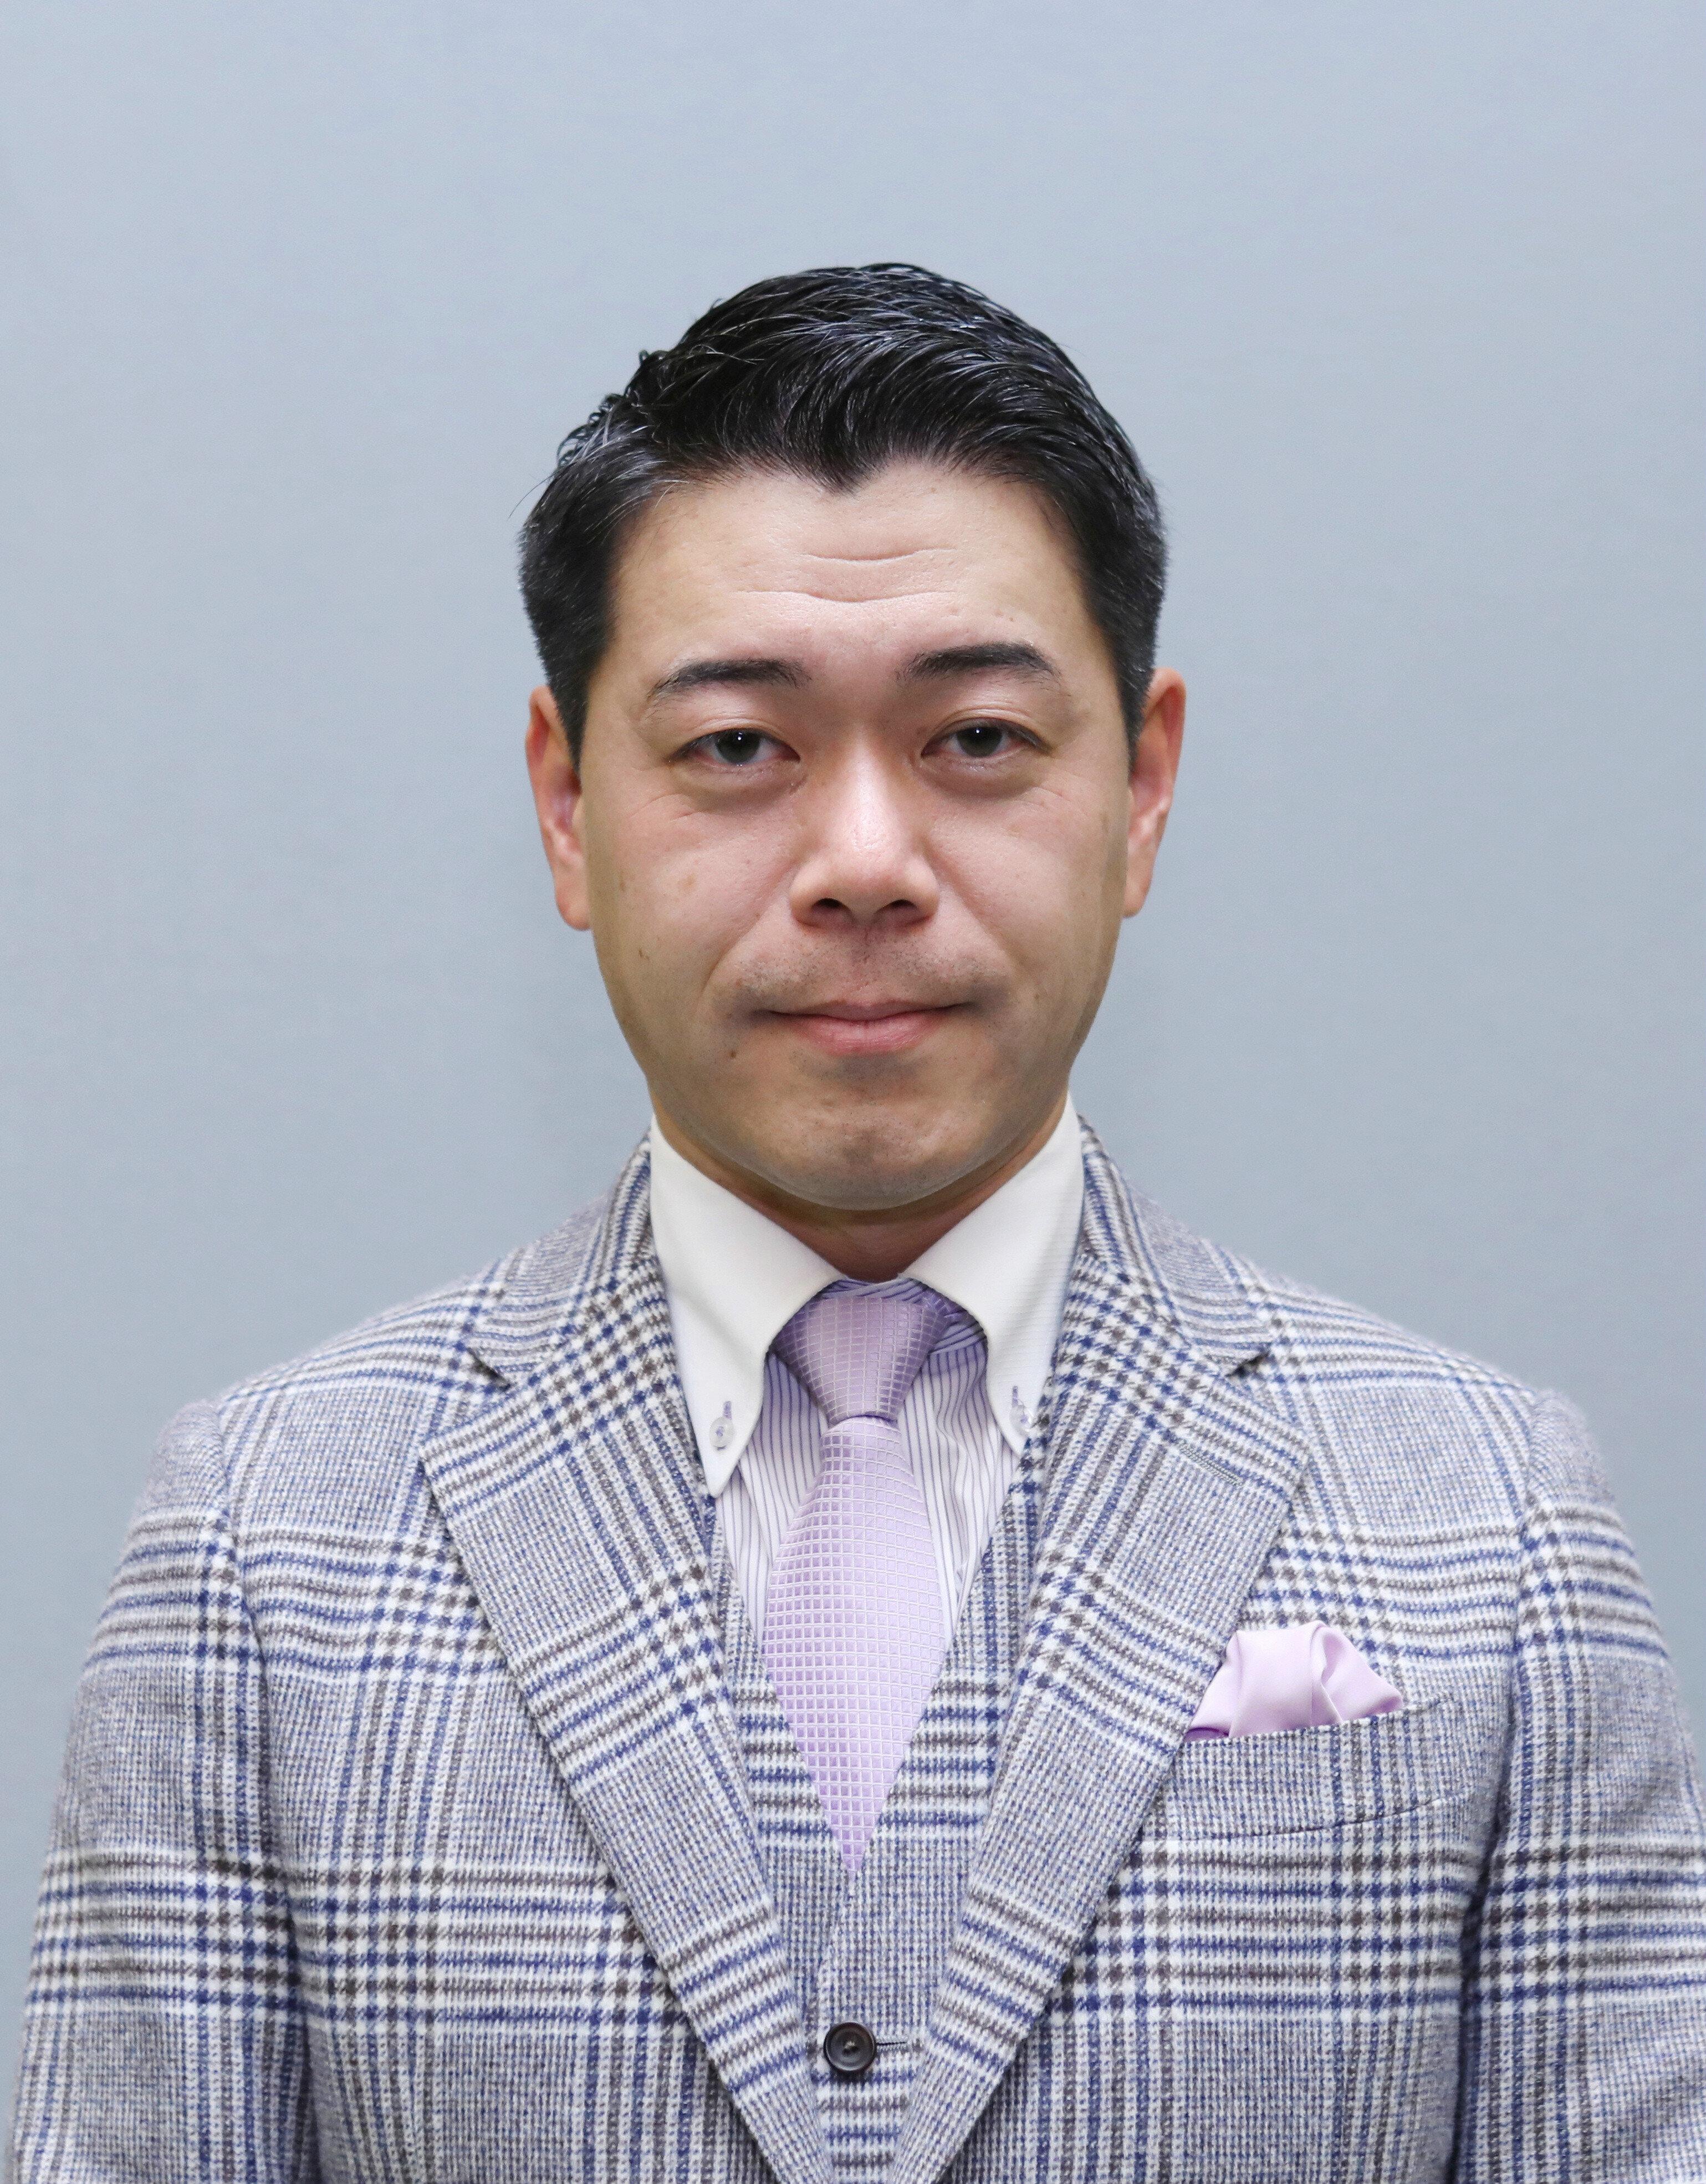 長谷川豊氏、差別発言を謝罪「弁解の余地のない」